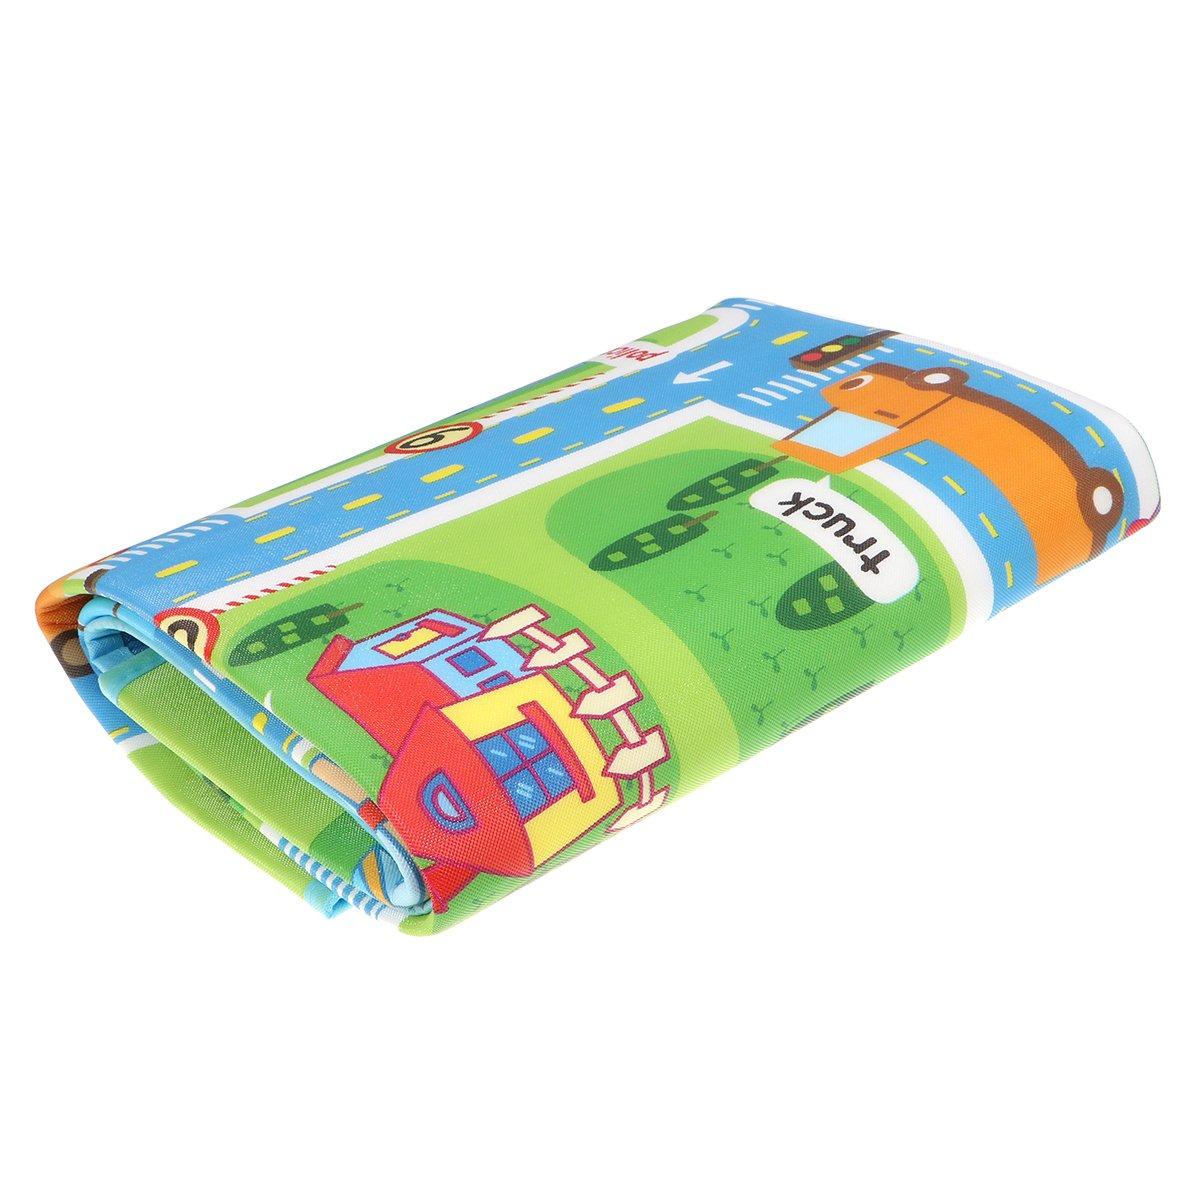 WINOMO Folding Baby Play Mat Moisture-Proof Street Map Children Learning Carpet Floor Carpet 130x160x0.5cm